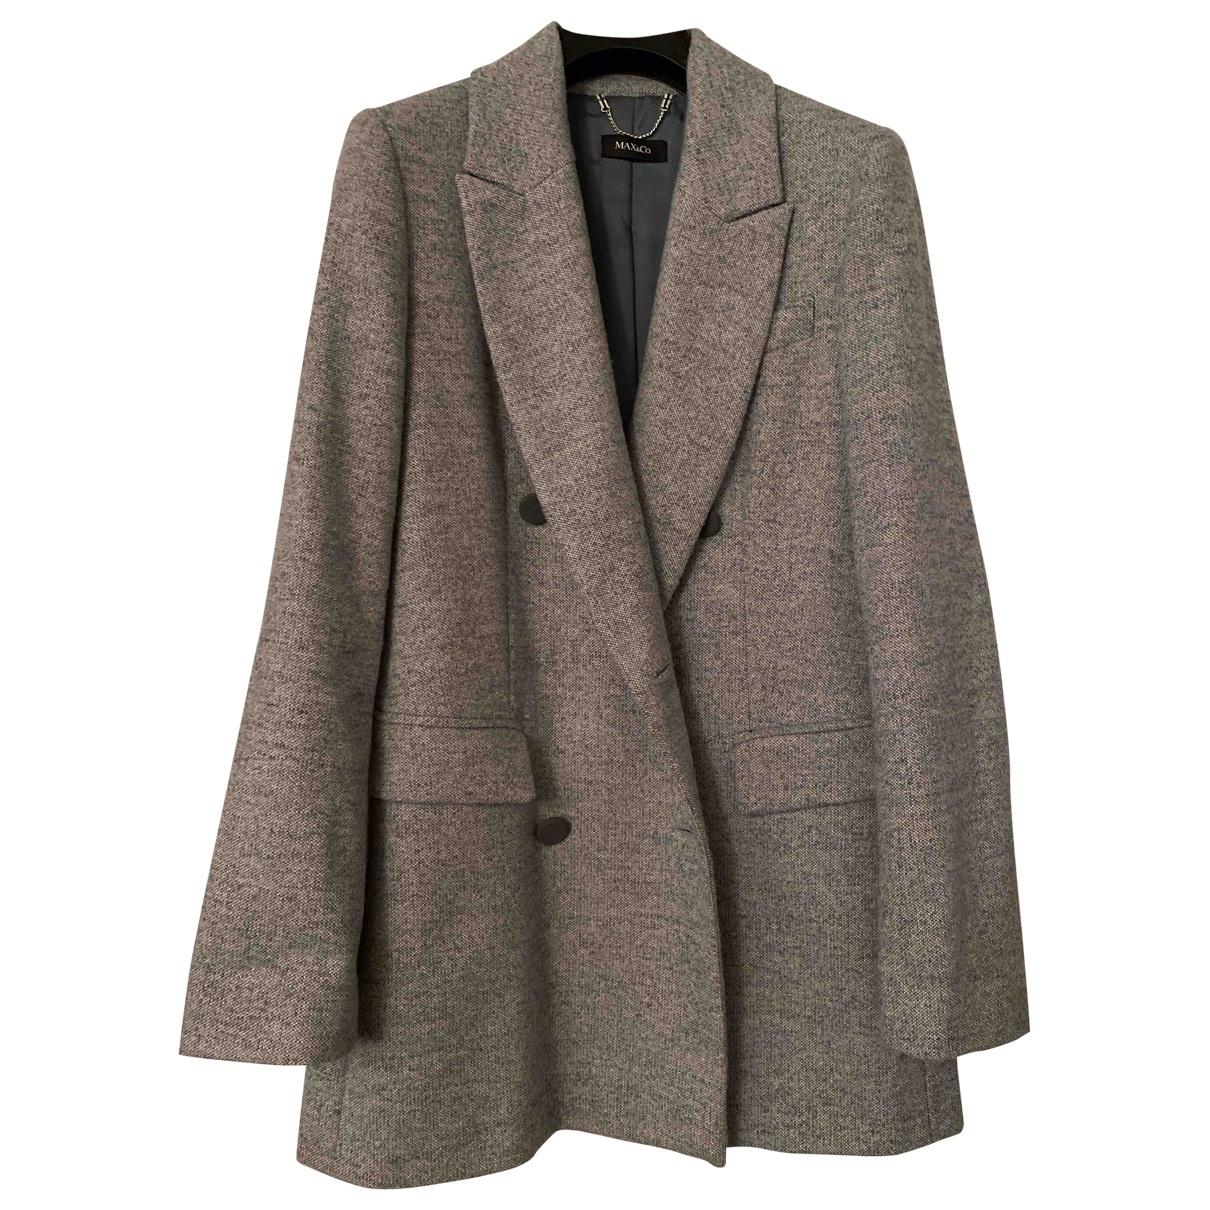 Max & Co \N Jacke in  Grau Wolle